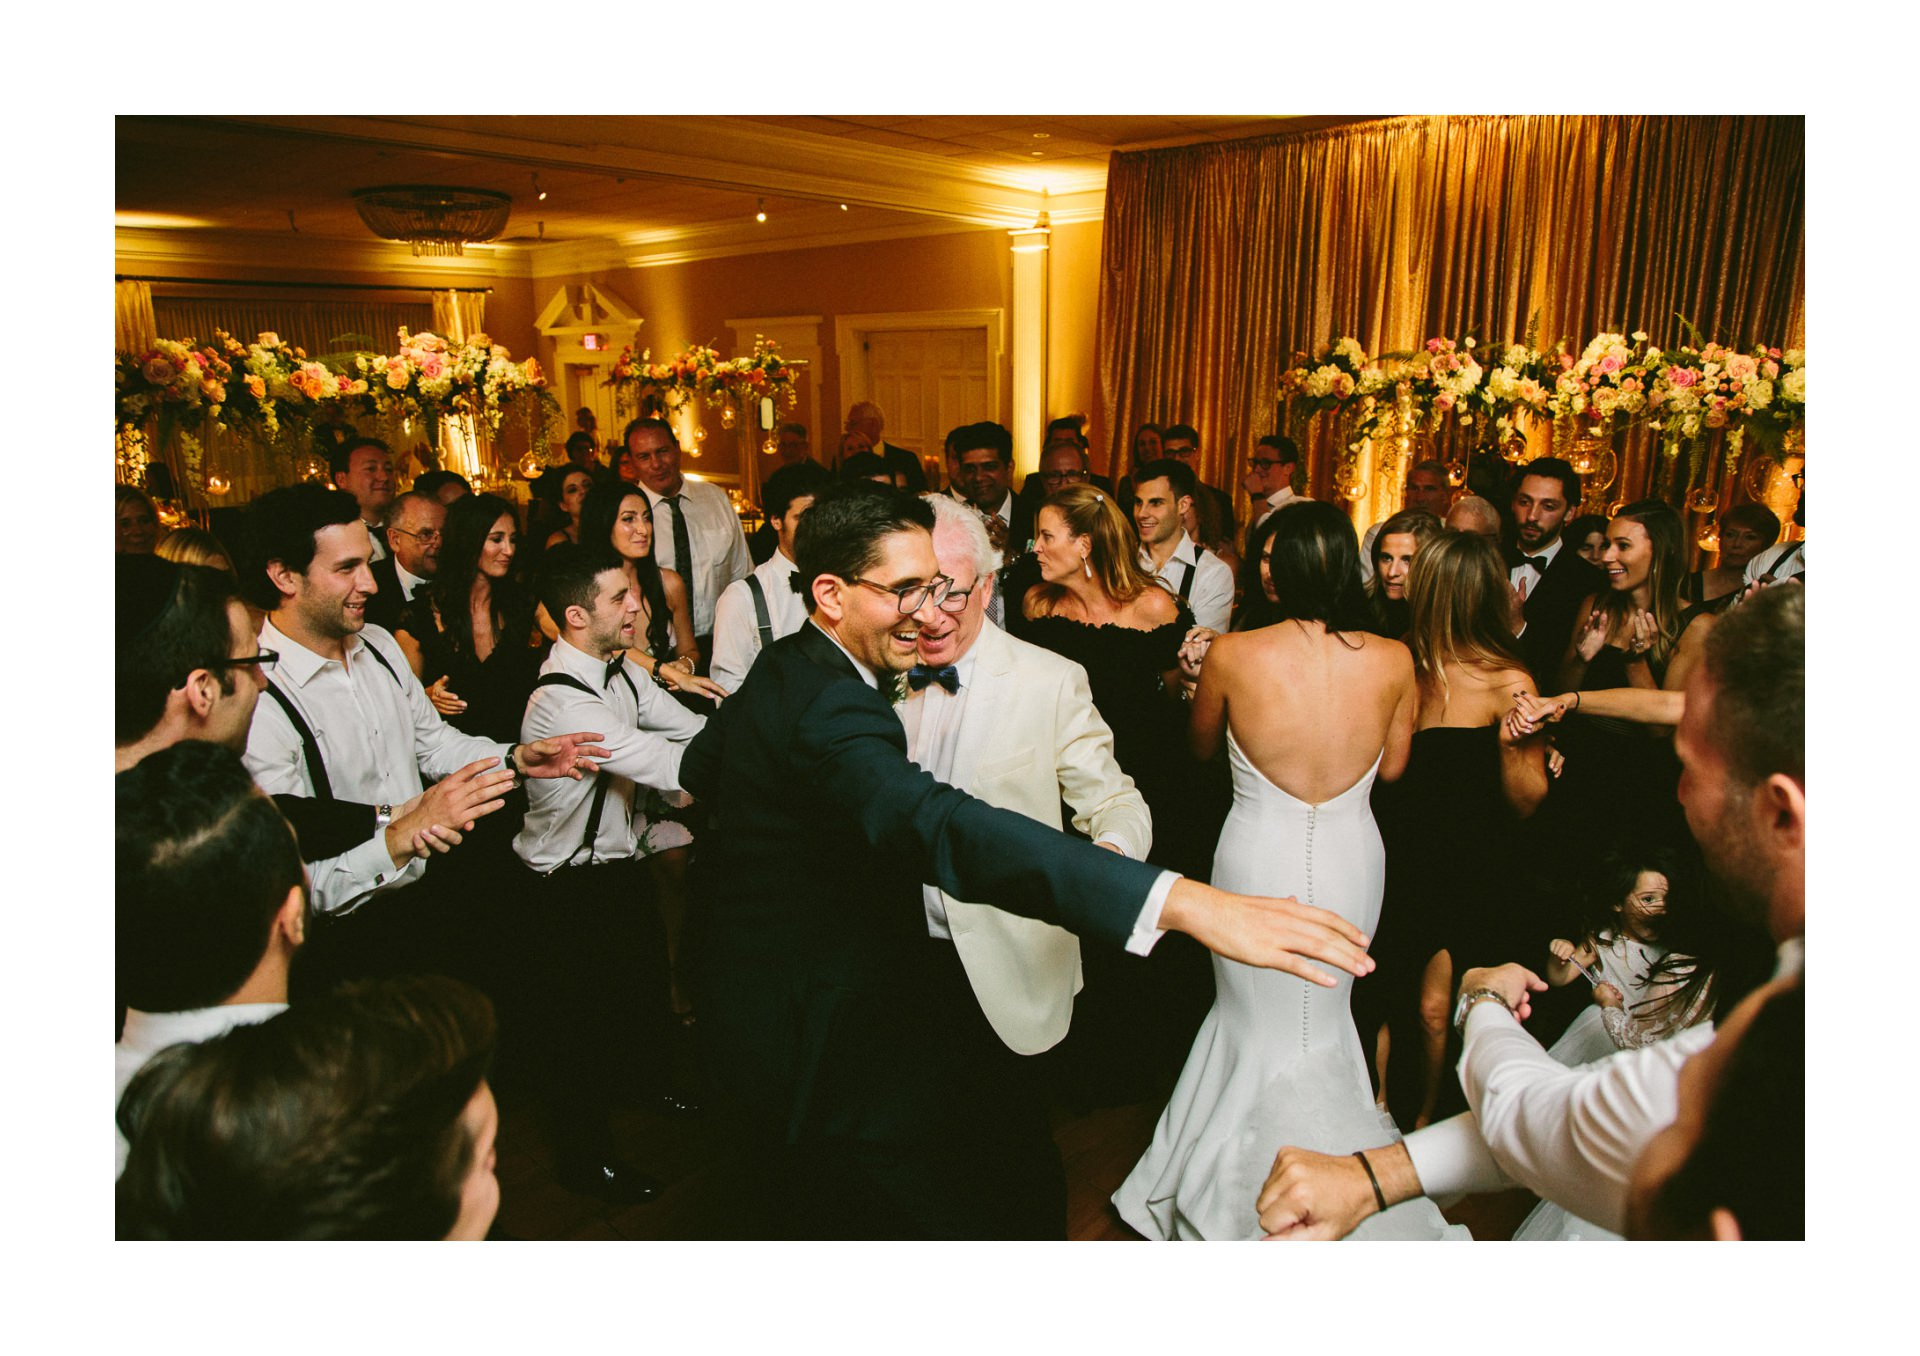 Beechmont Country Club Wedding Photographer in Beachwood 3 19.jpg